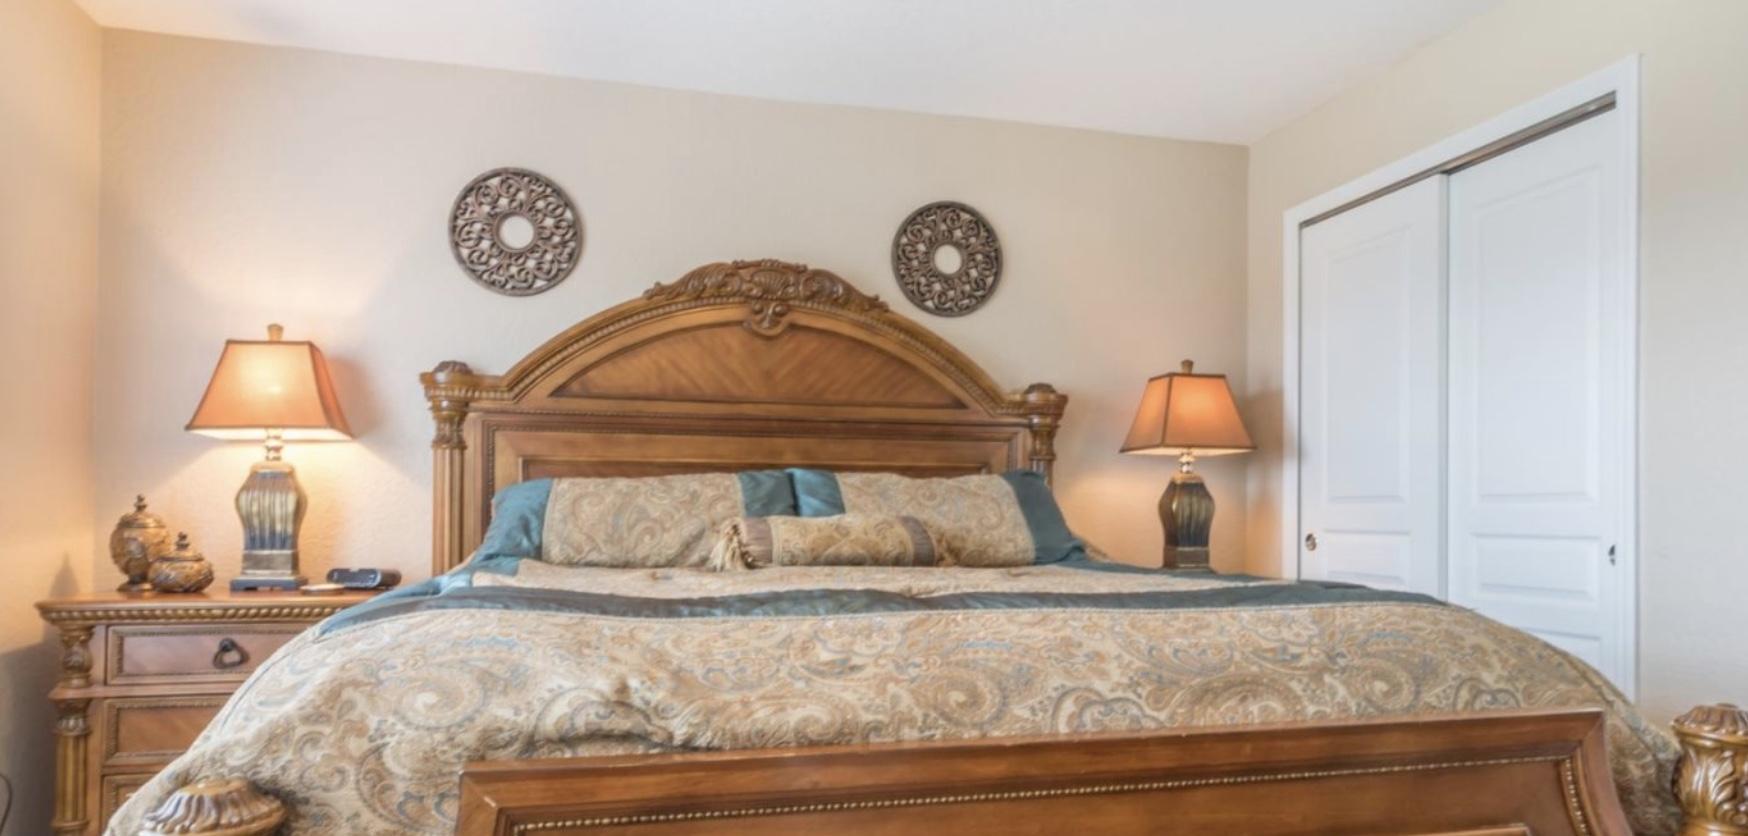 Luxurious bedding again on no.2 master en-suite